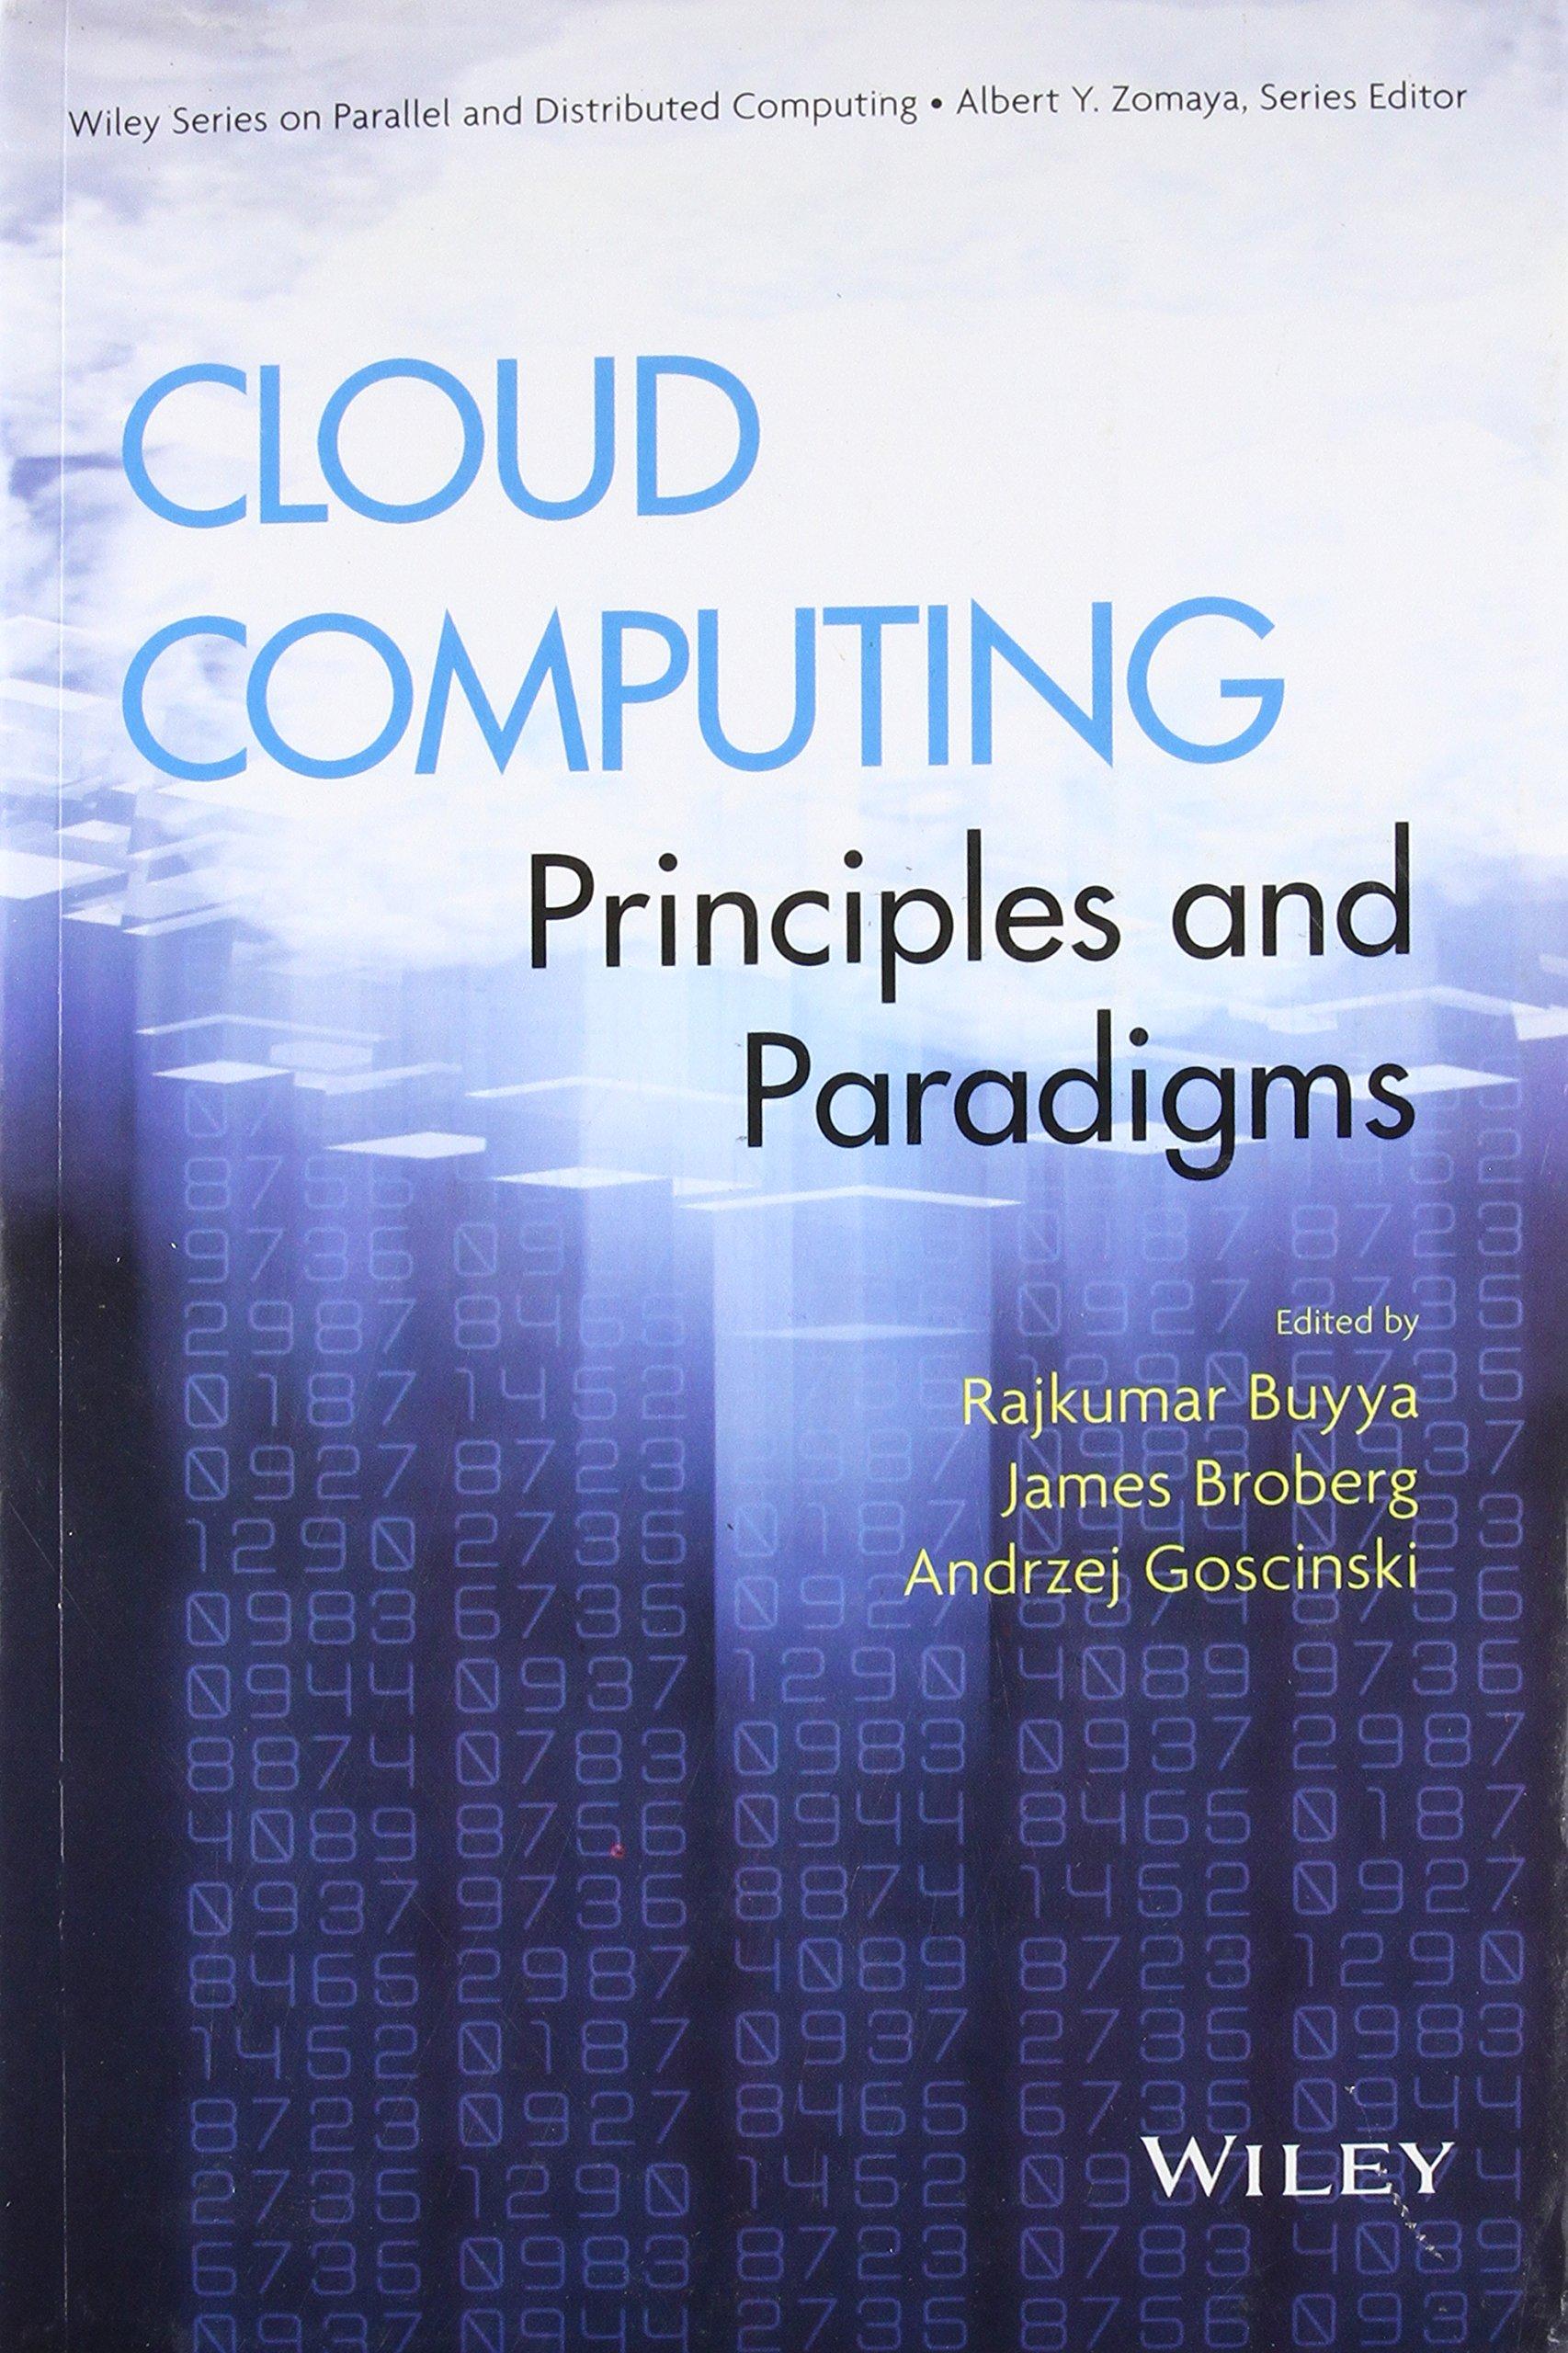 cloud-computing-principles-and-paradigms